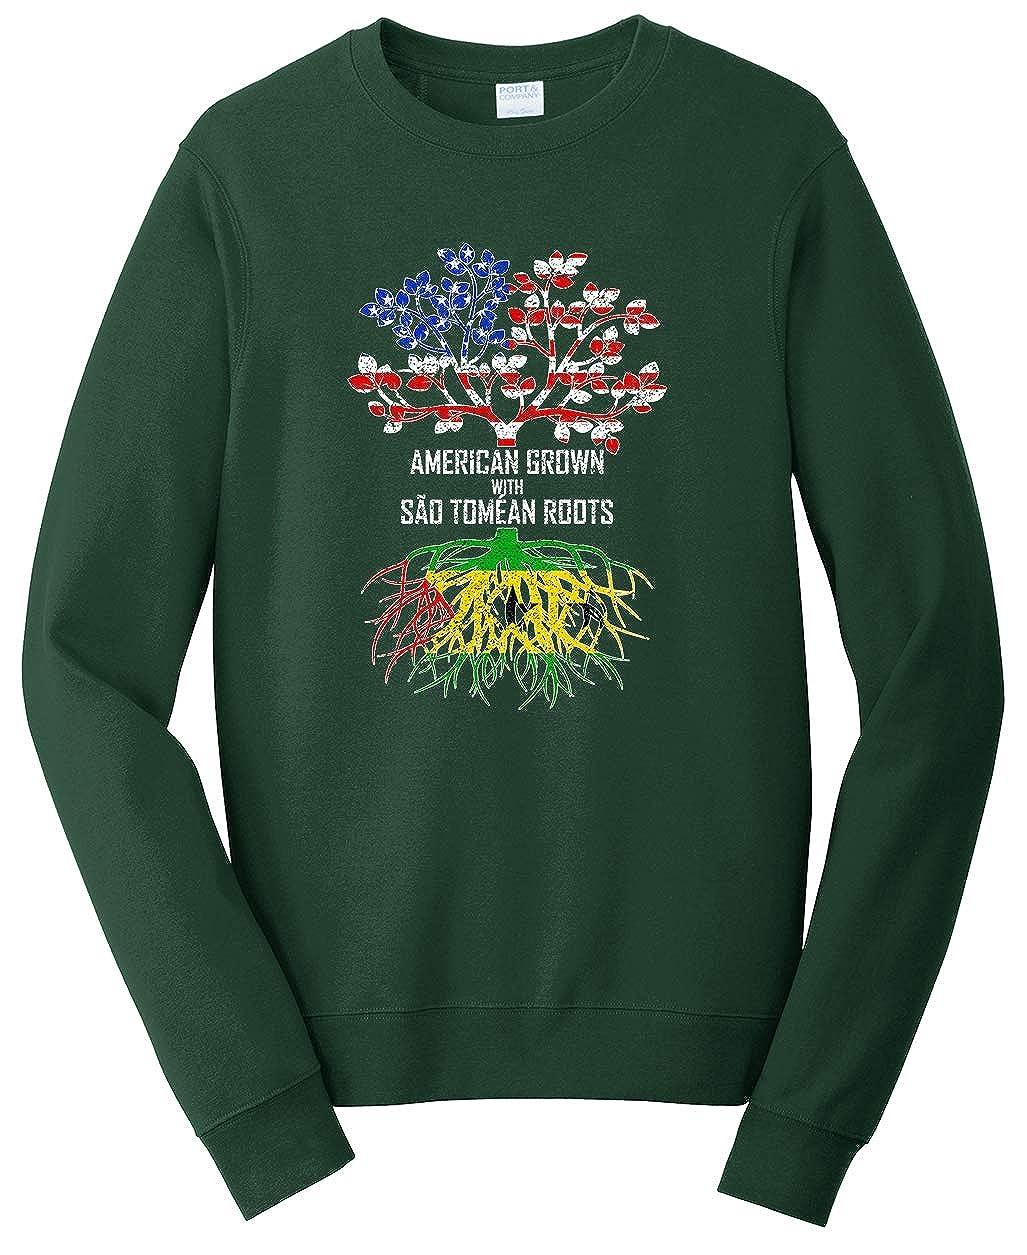 Tenacitee Unisex American Grown with S/ão Tom/éan Roots Sweatshirt